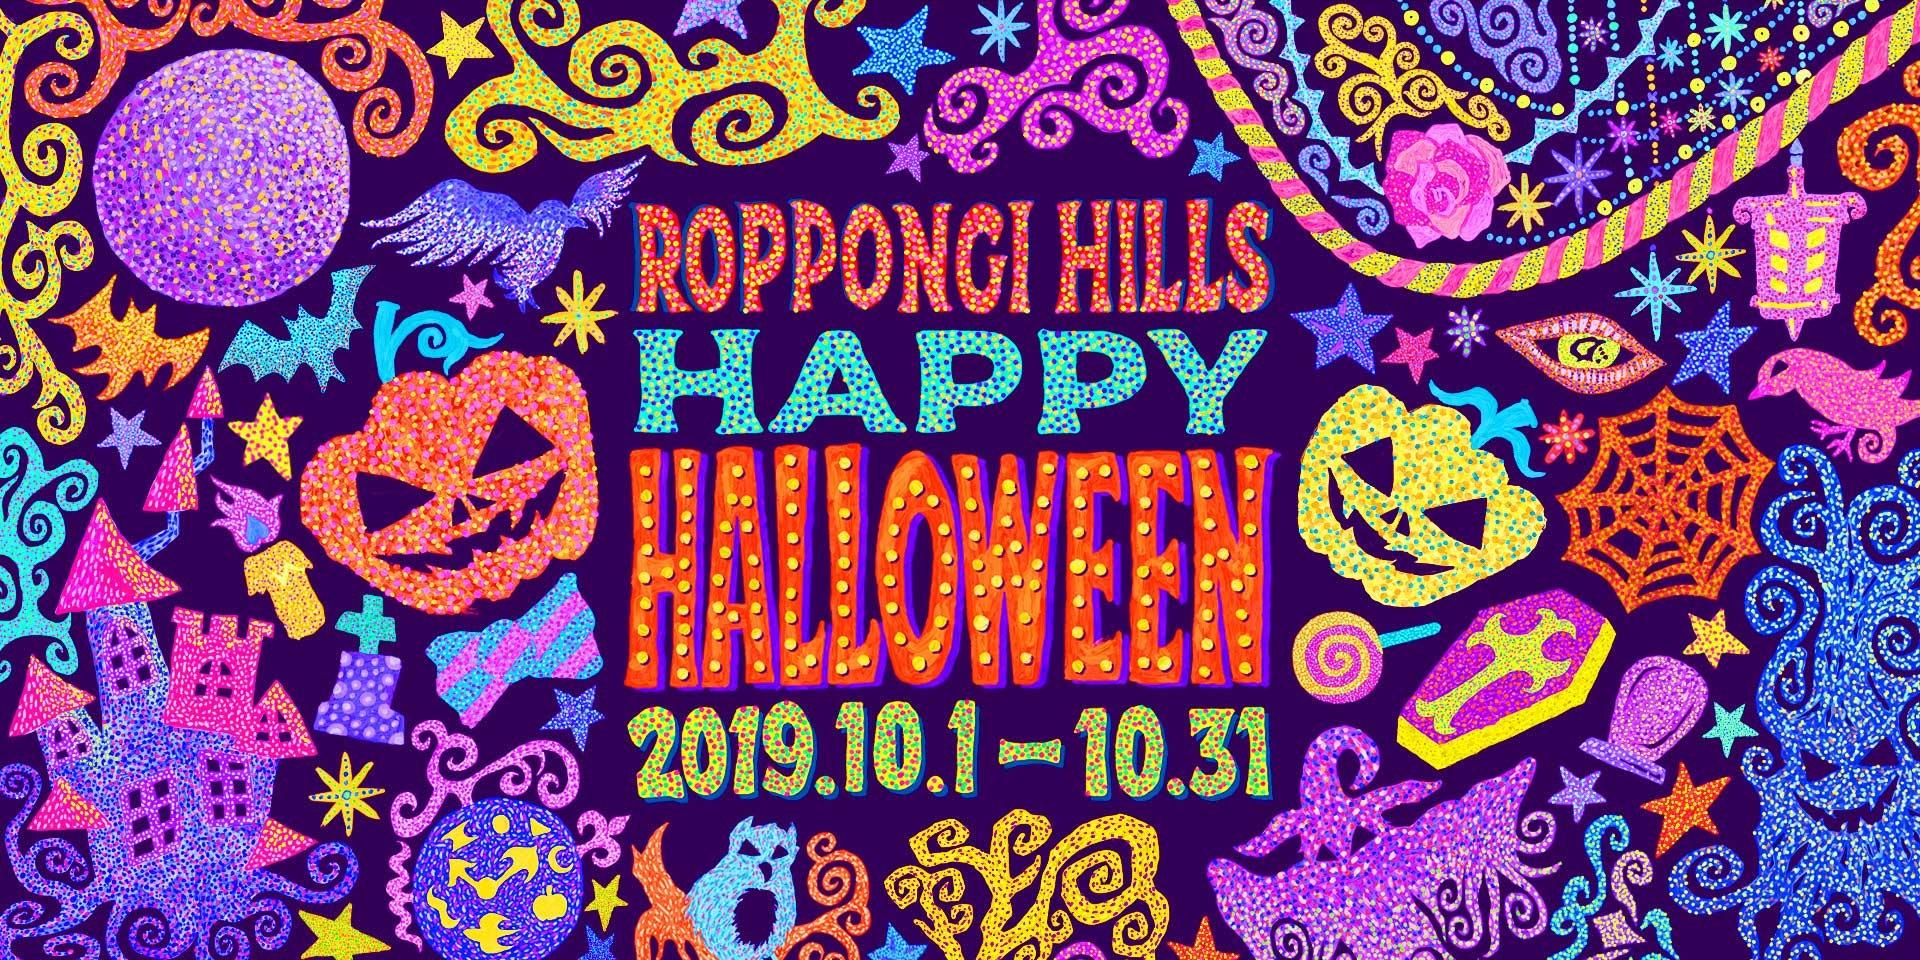 roppongihillshappyhalloween2019